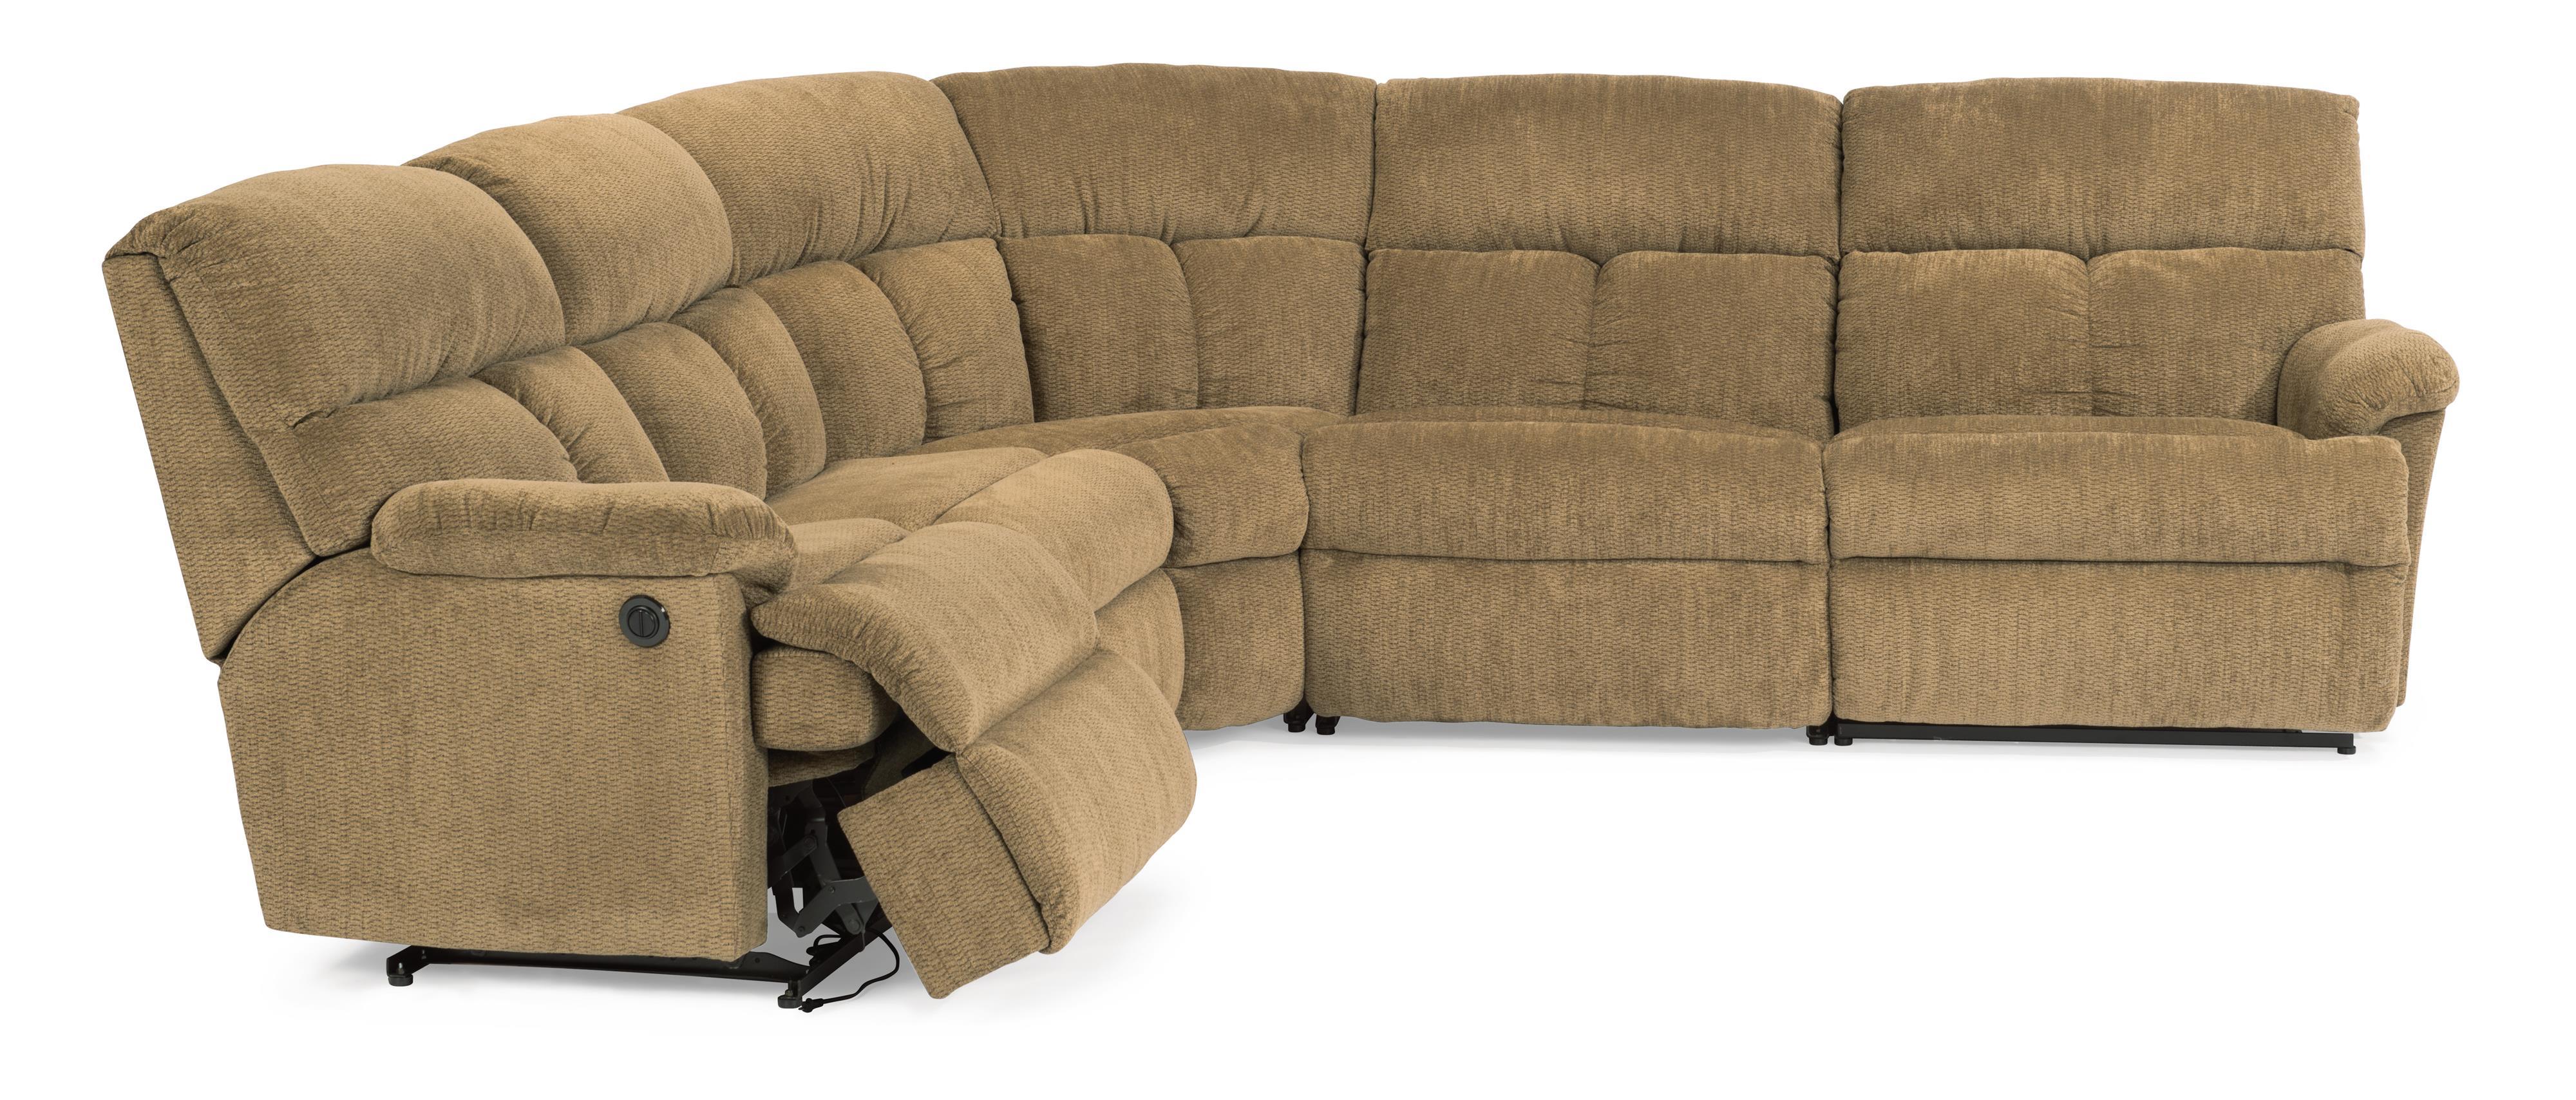 Flexsteel Triton Reclining Sofa Sectional  Conlins